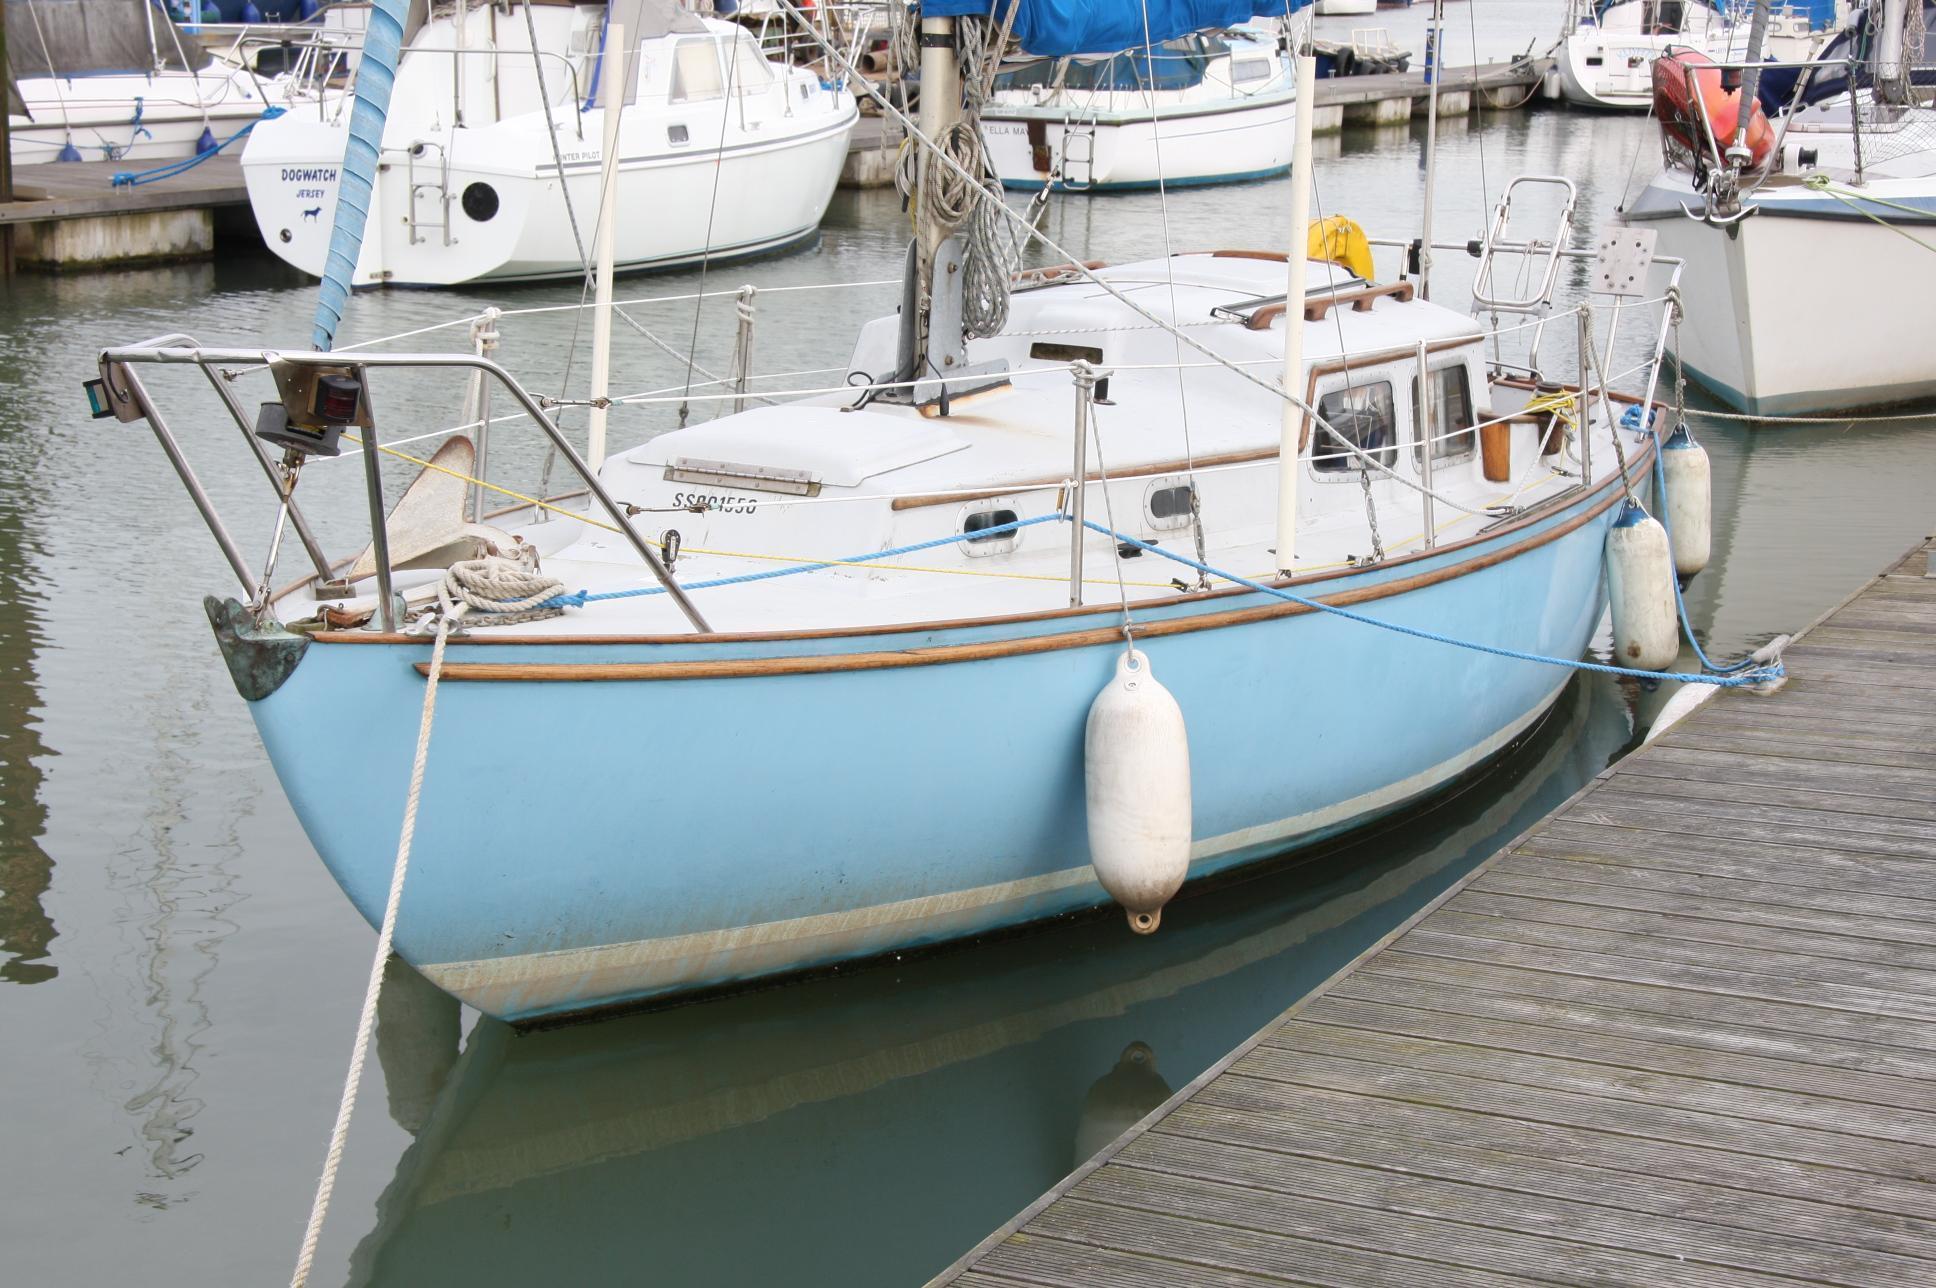 Trident , Titchmarsh Marina, Essex